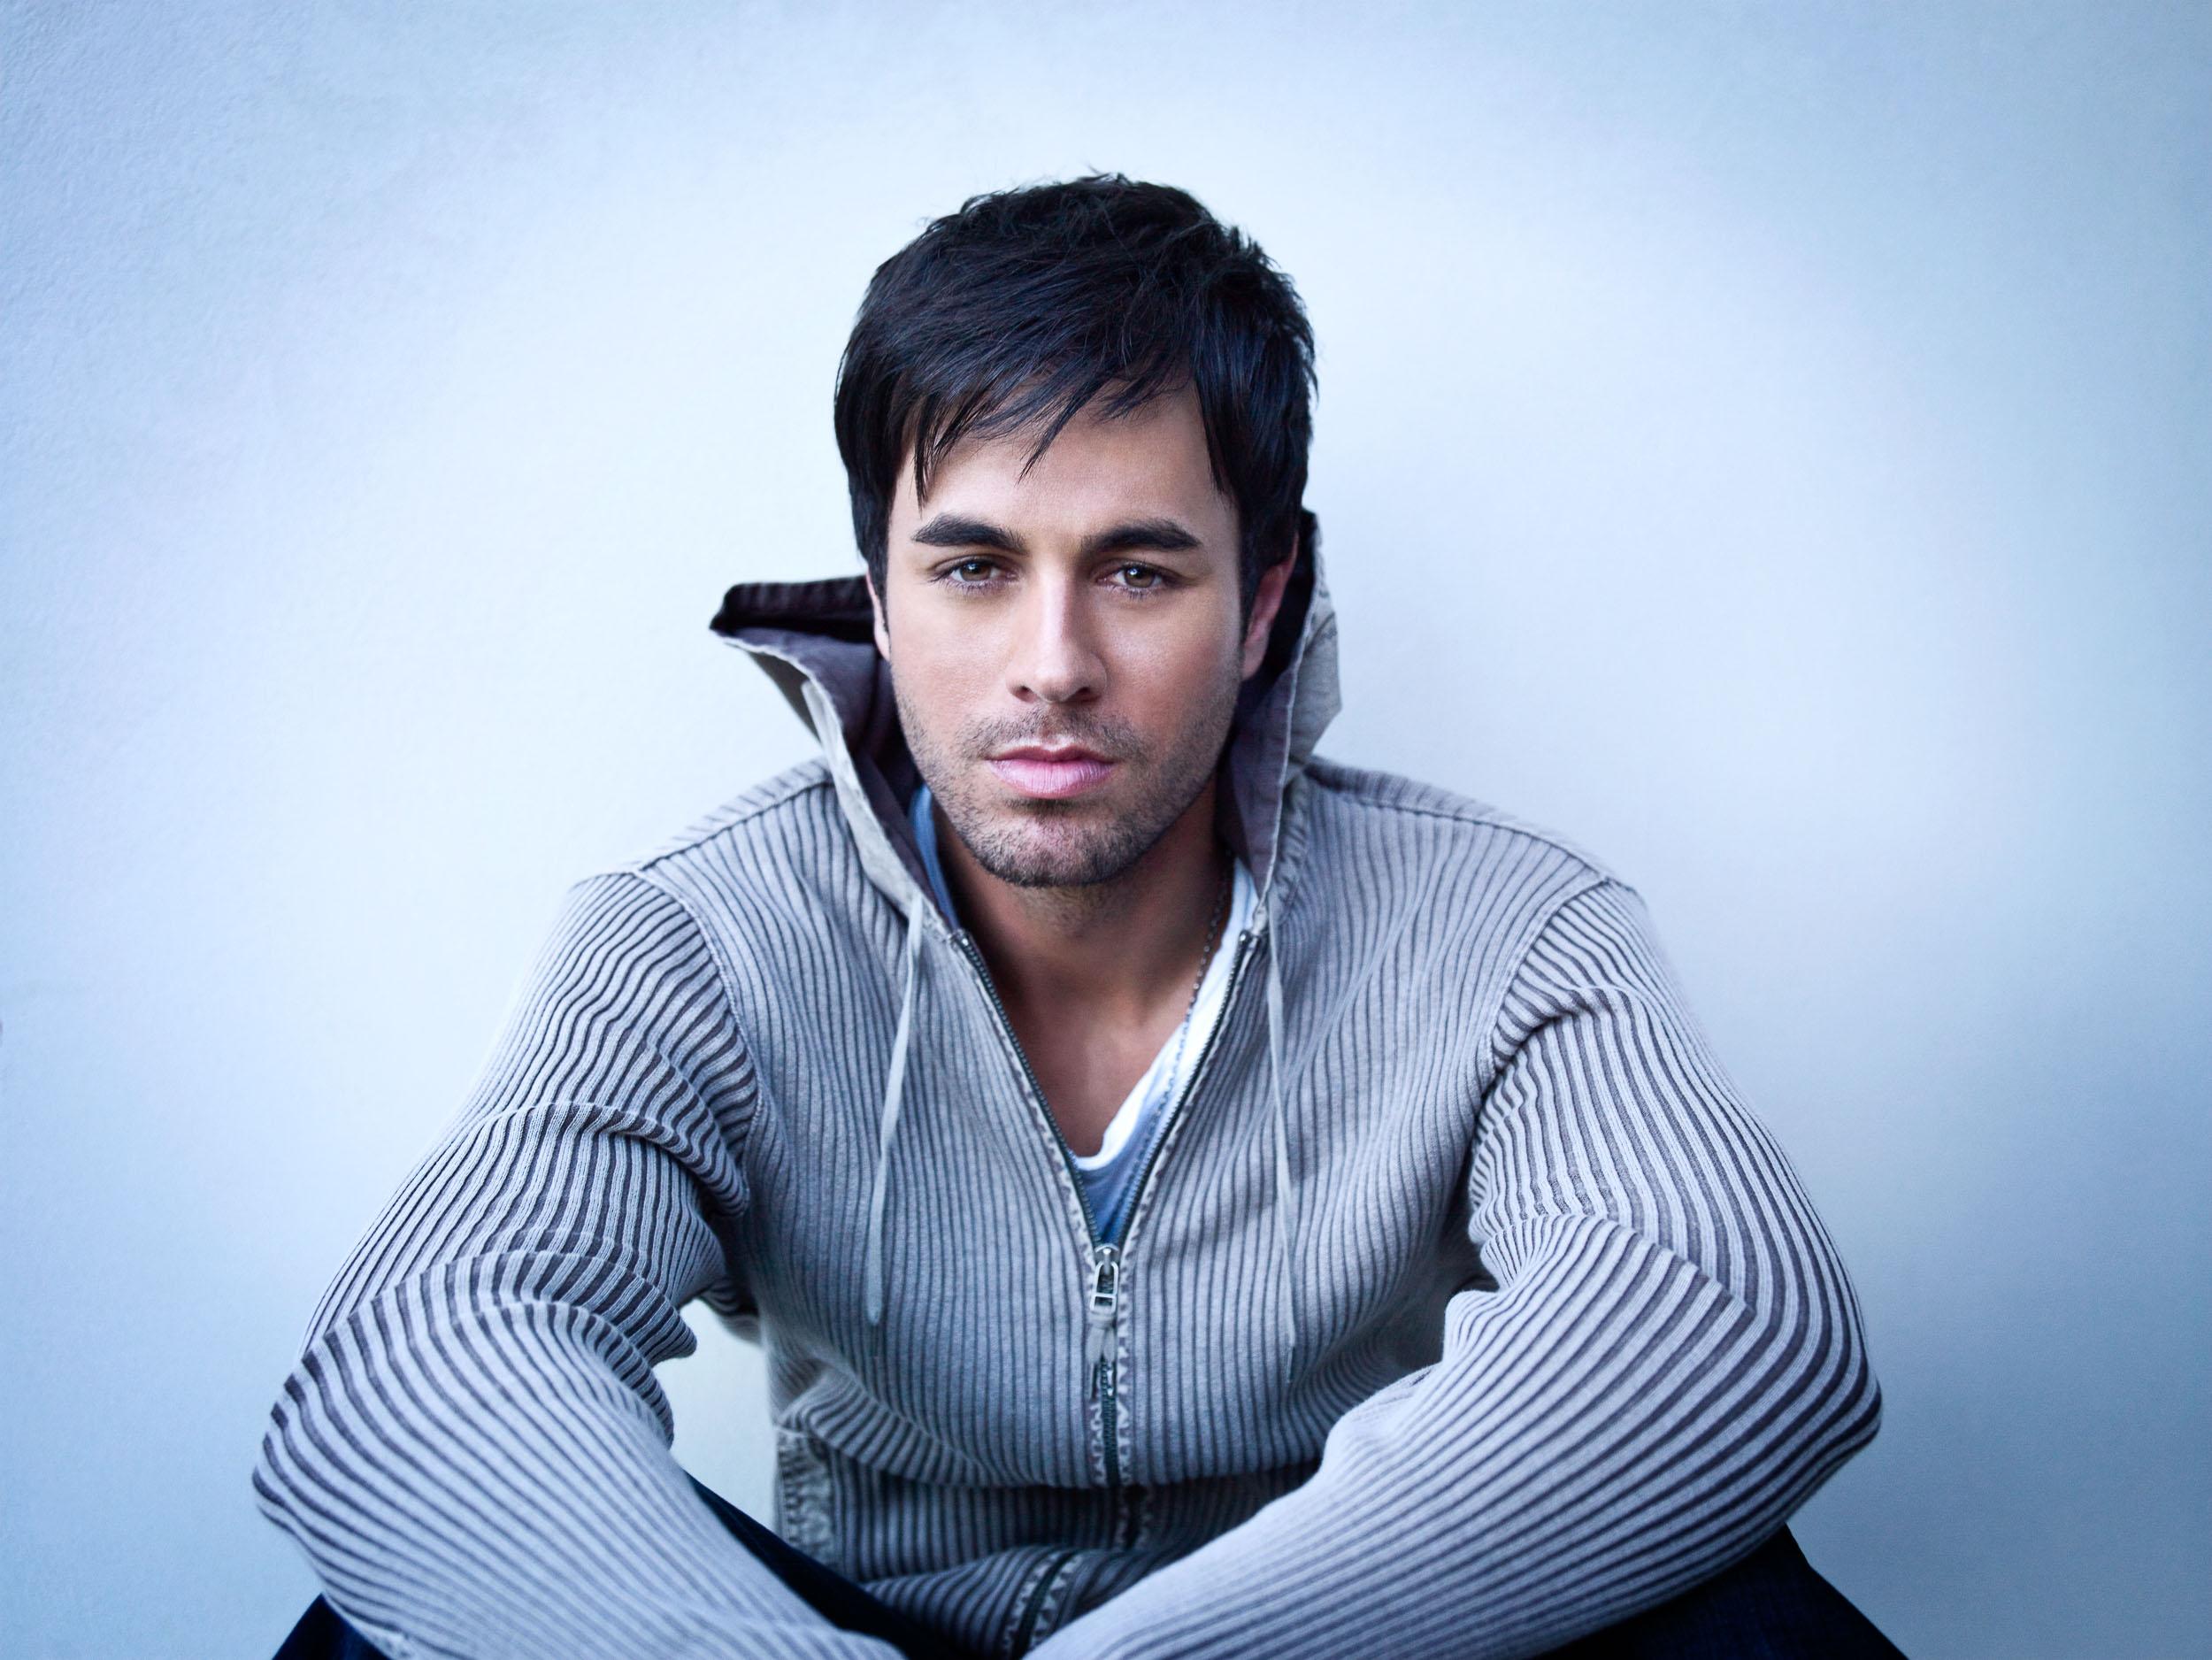 Enrique_Iglesias-Chapman_Baehler25.jpg